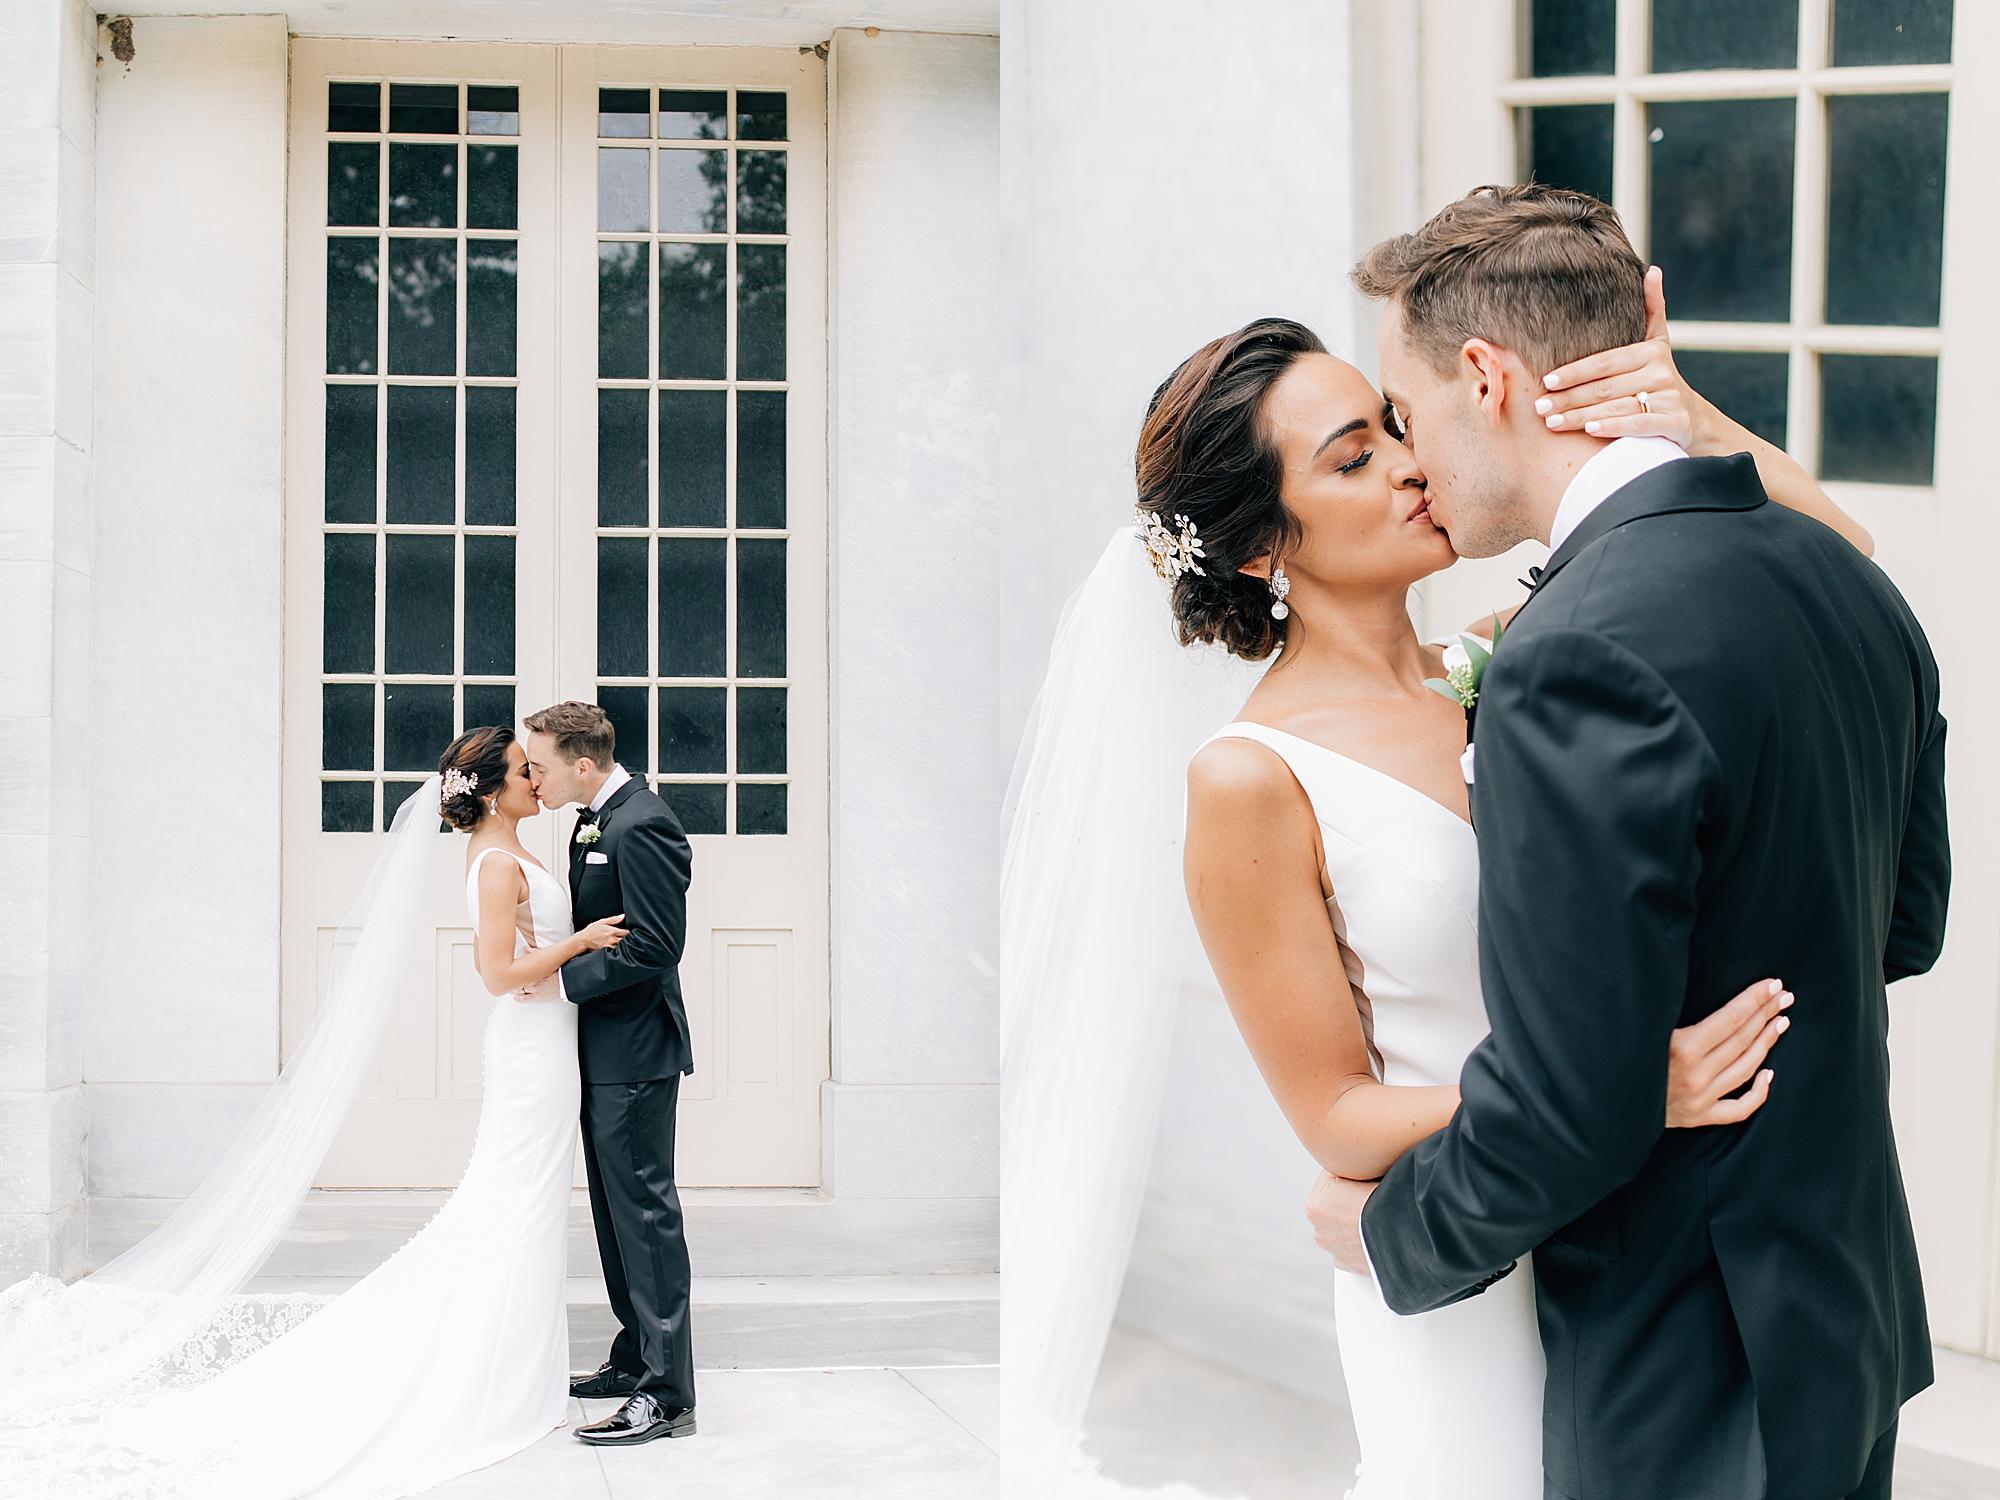 Cescaphe Philadelphia Film Wedding Photography by Magdalena Studios 34